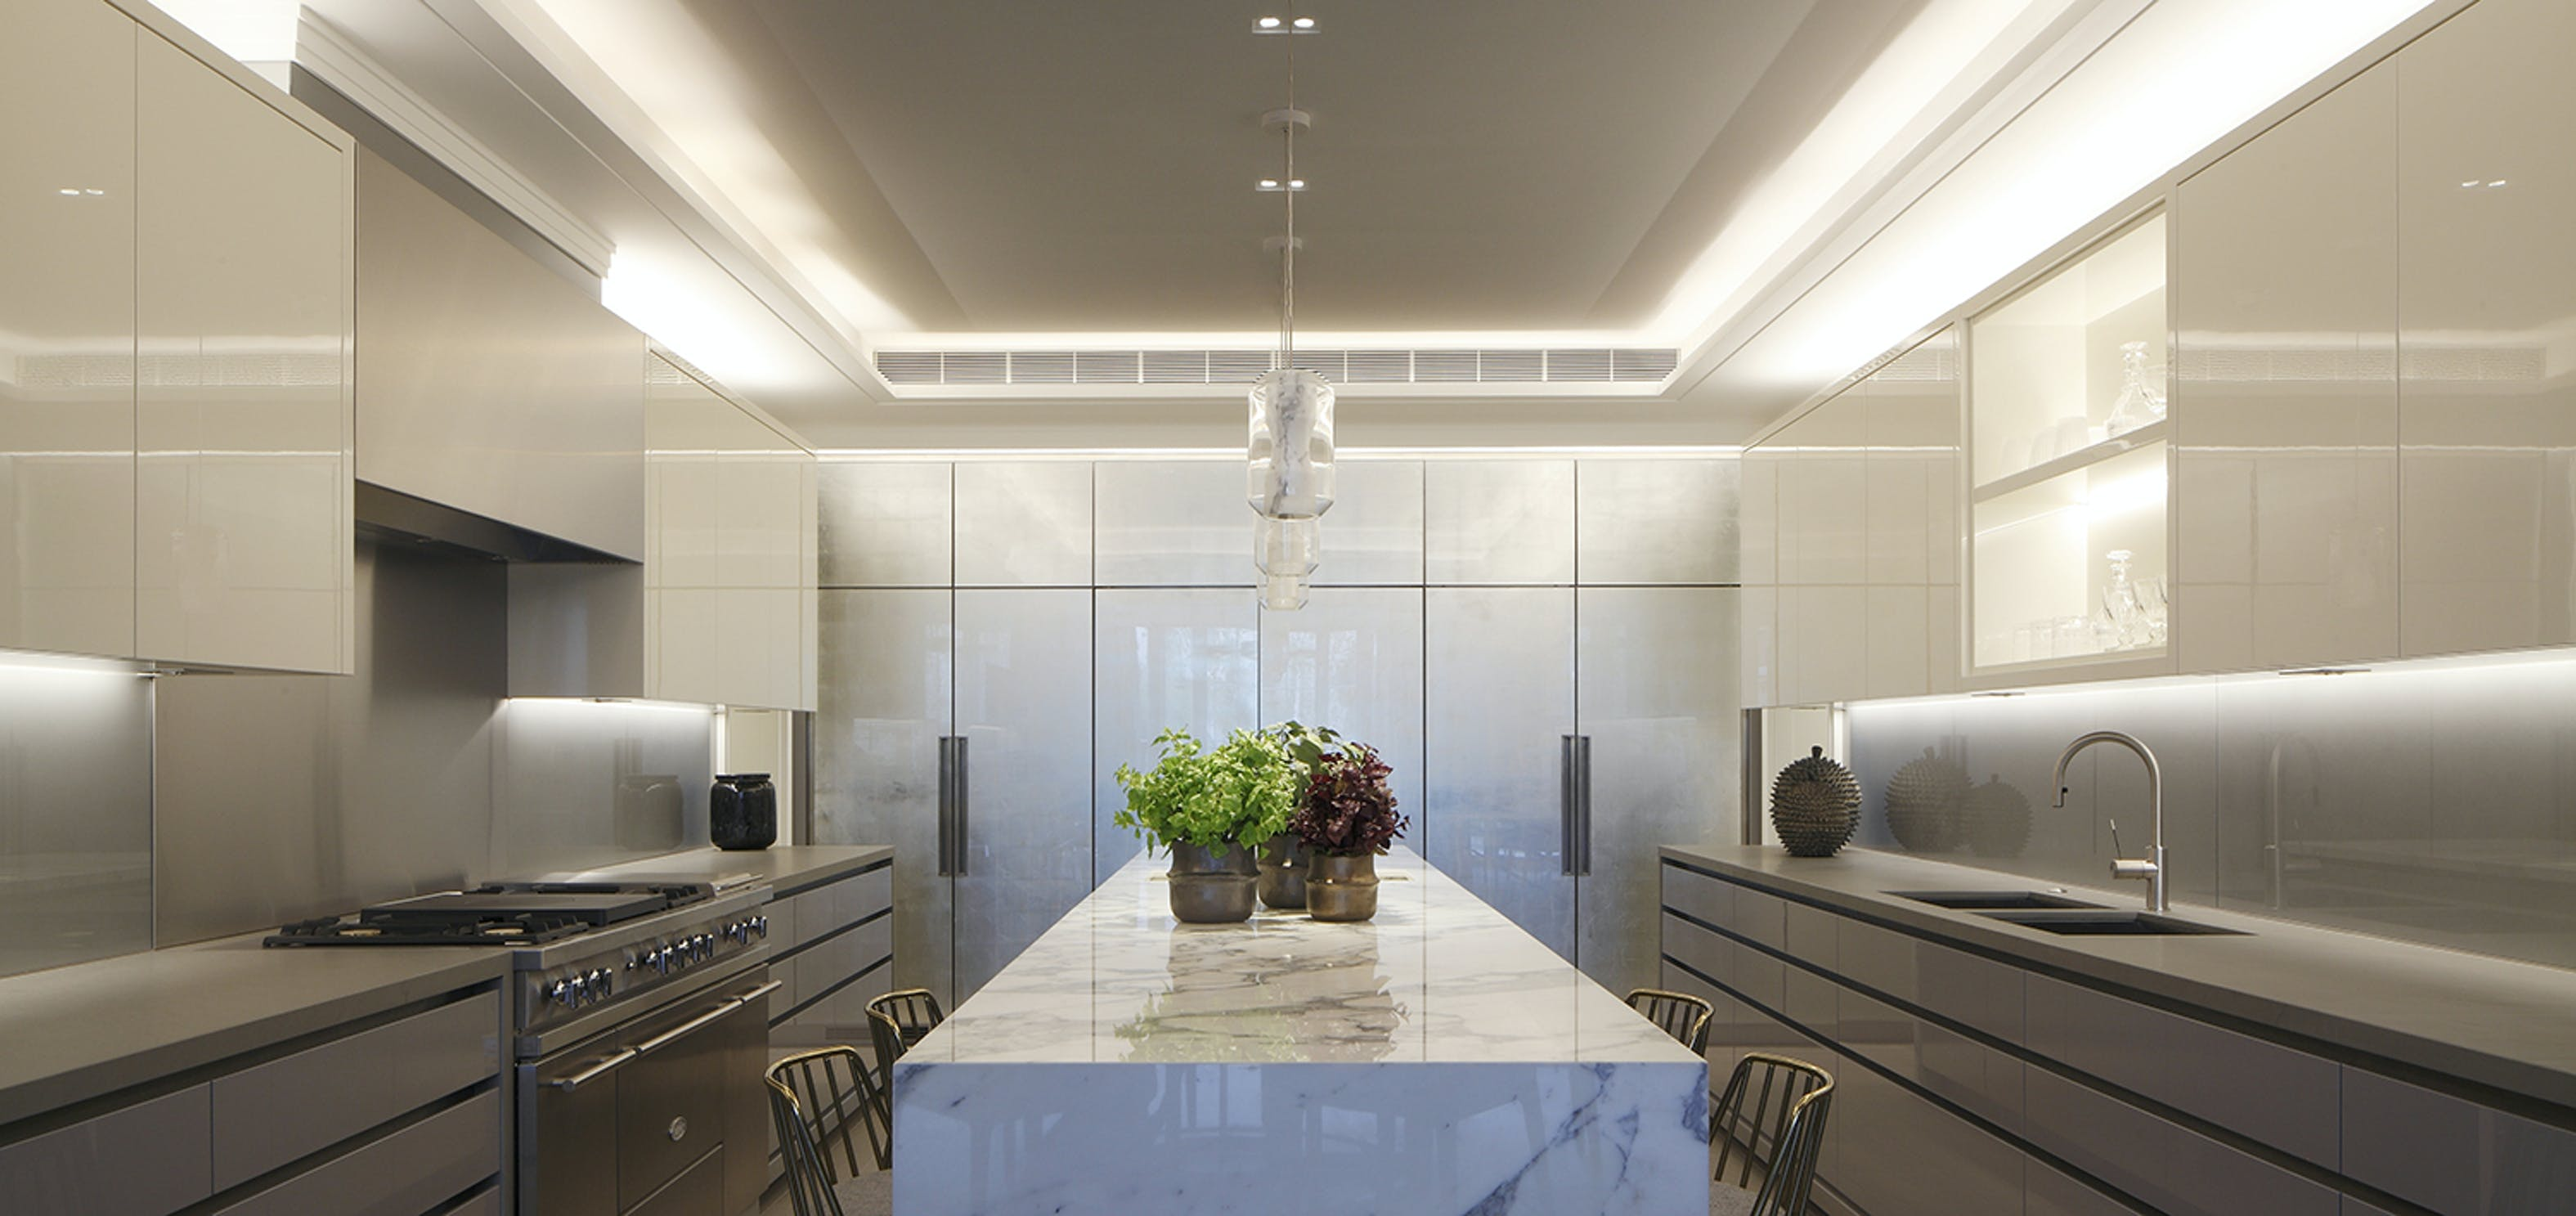 Minimalist Kitchen Lighting design and products